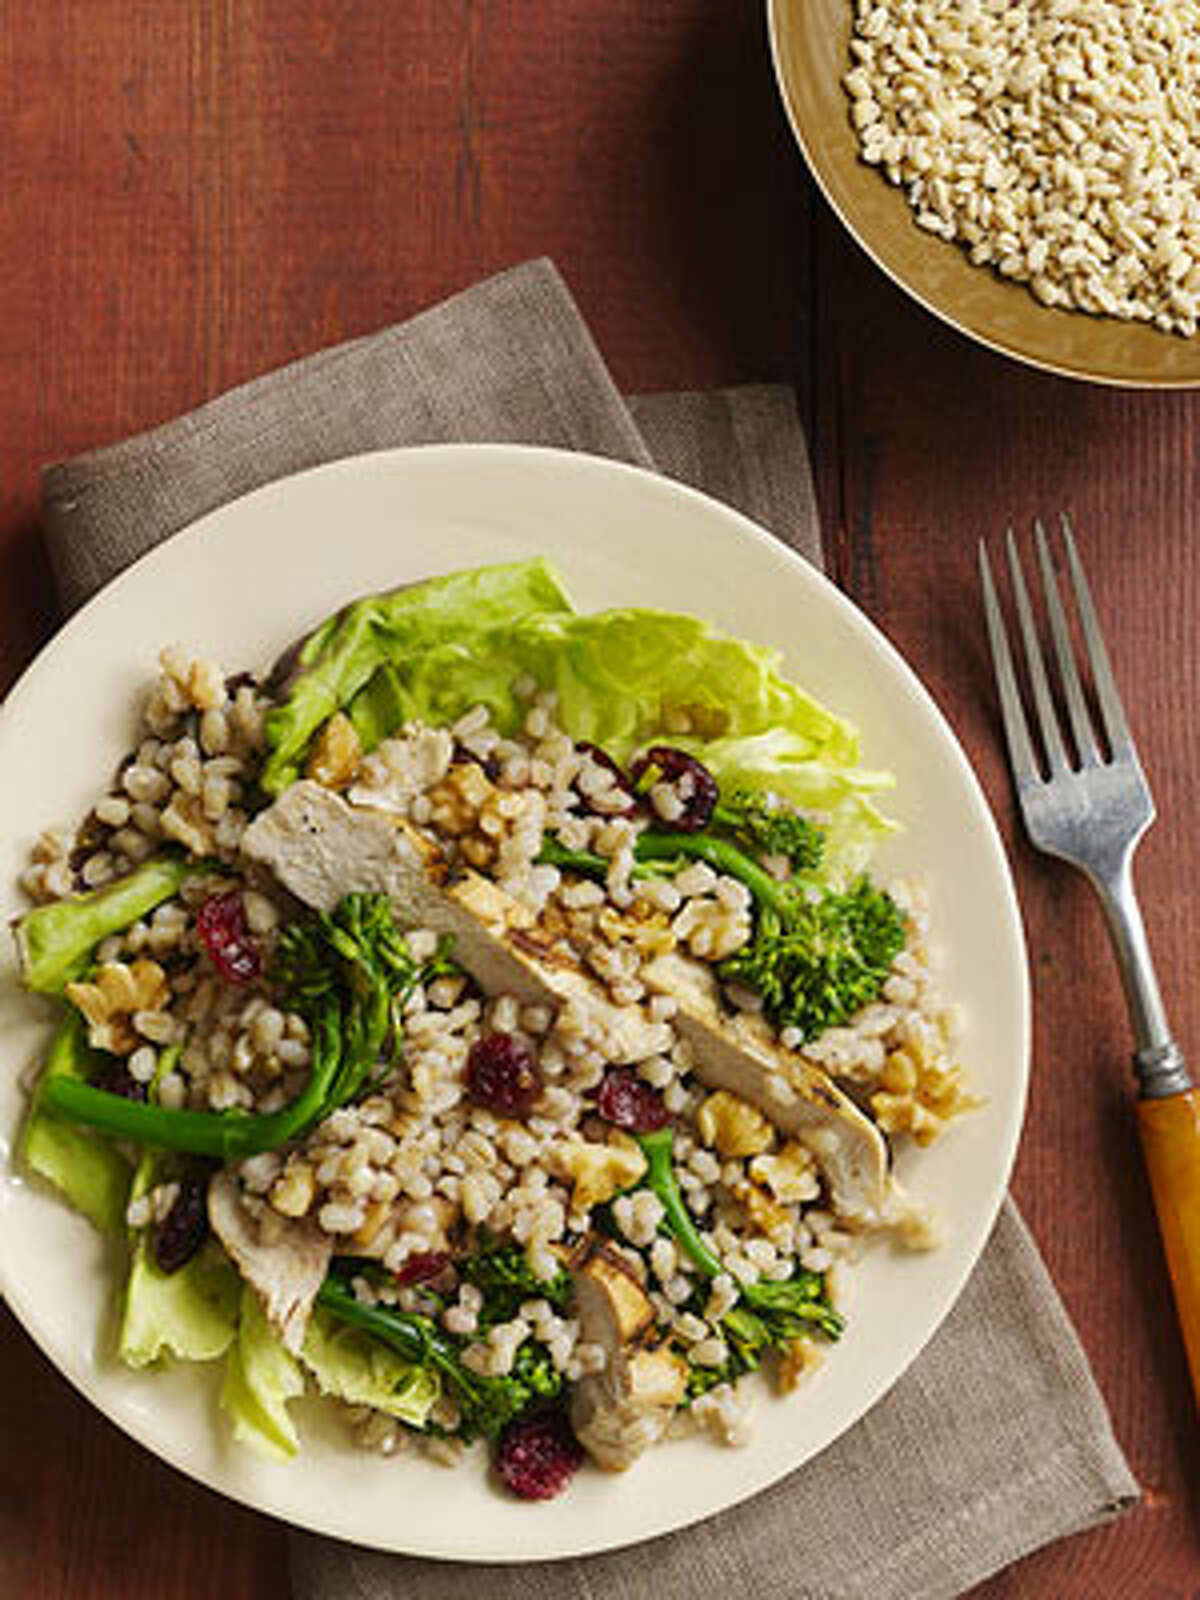 Chicken and Barley Salad (recipe.com)